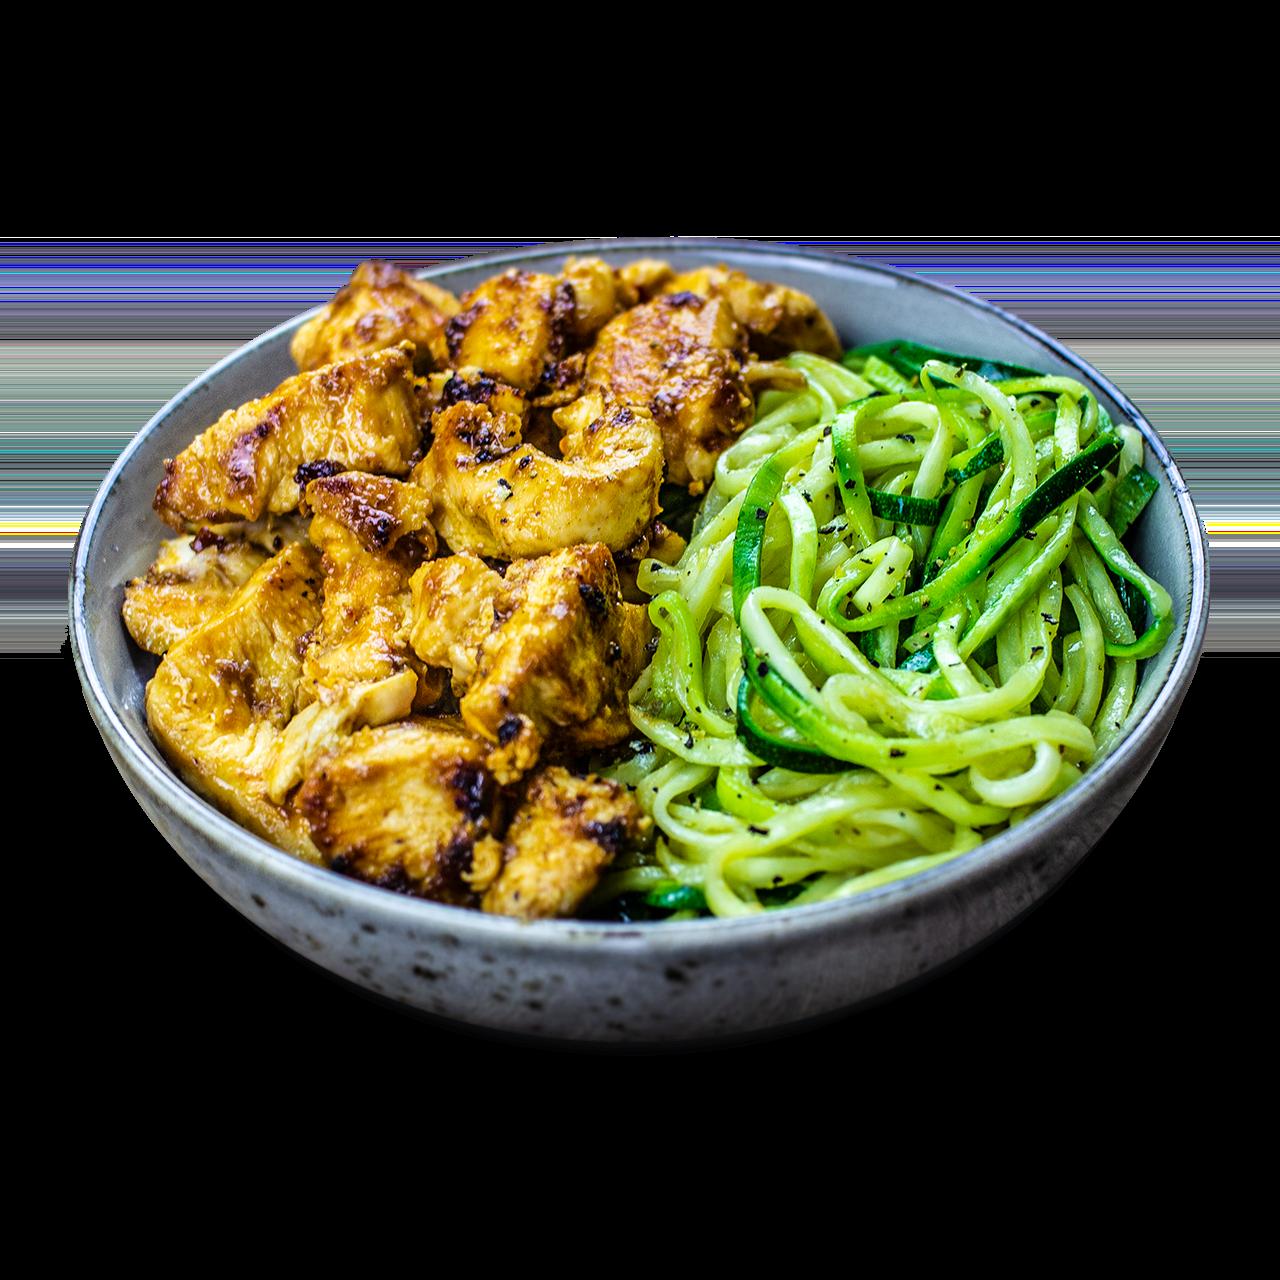 tostibanaan-pittige-kip-courgette-noodles